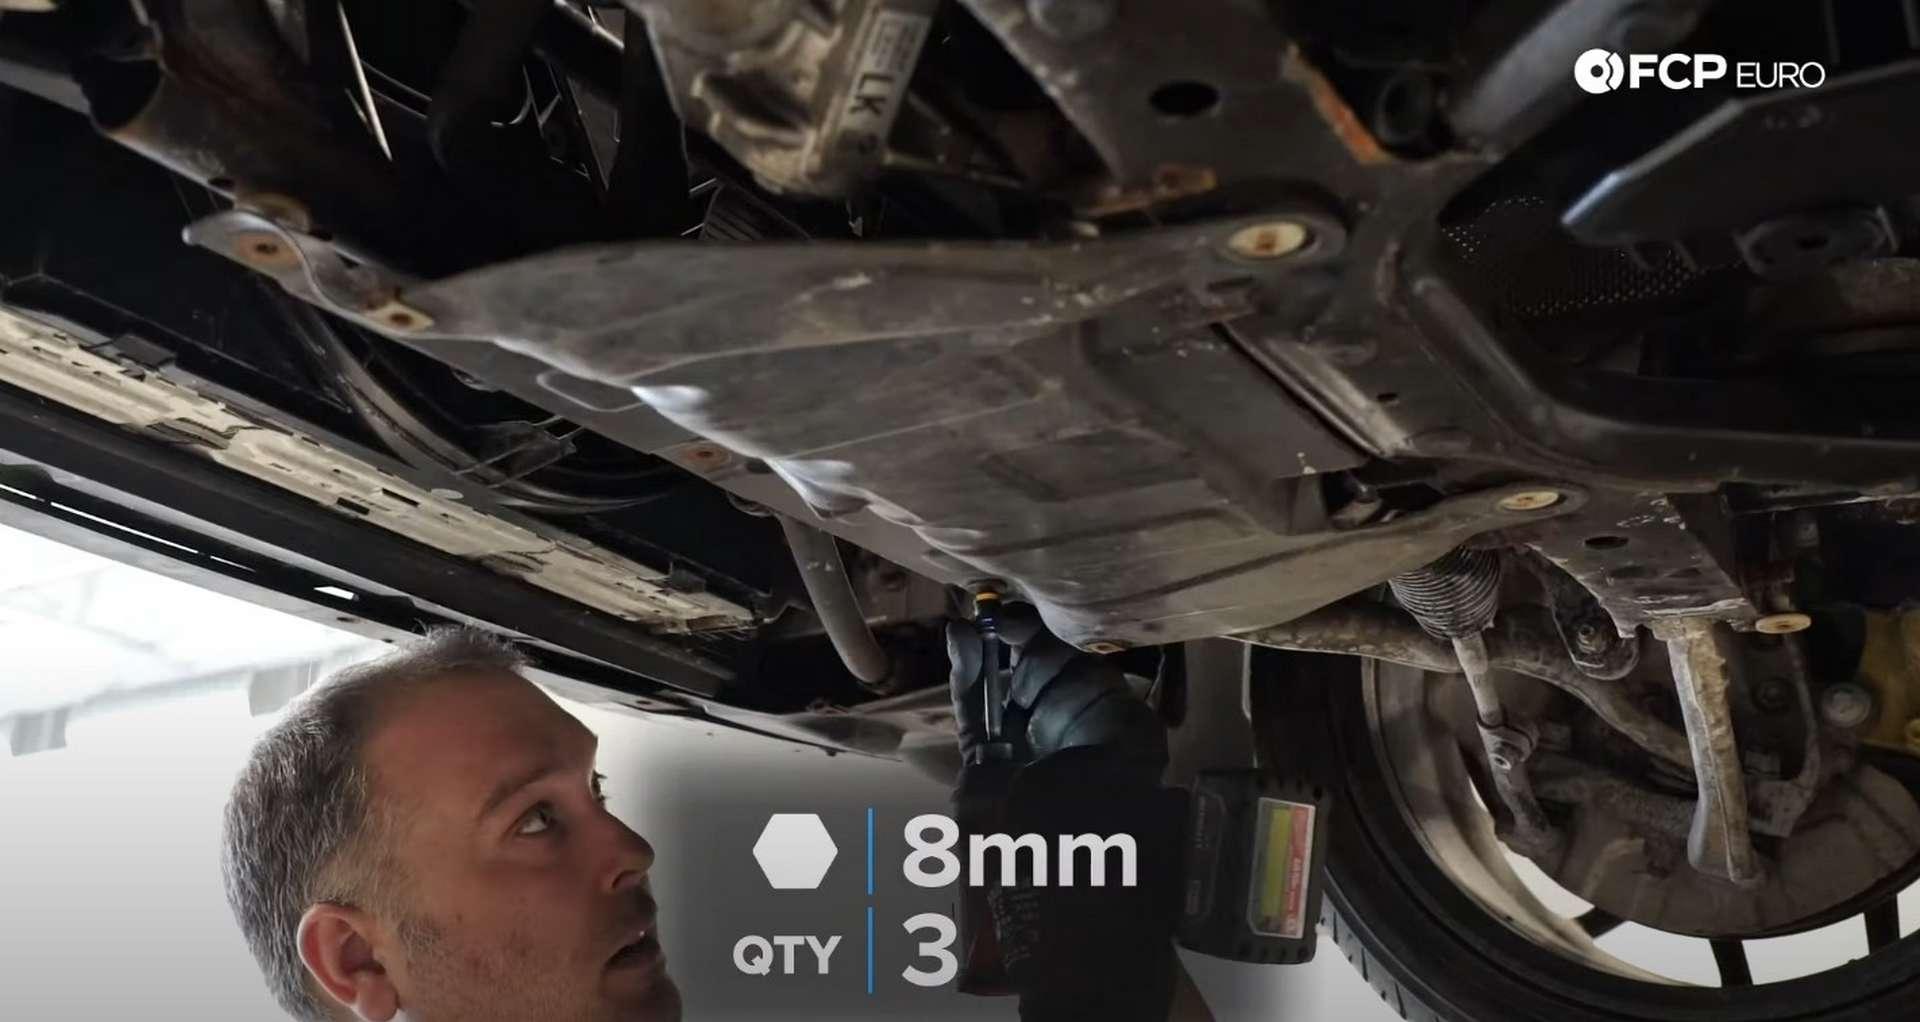 DIY BMW F30 Radiator Replacement removing the splash shield